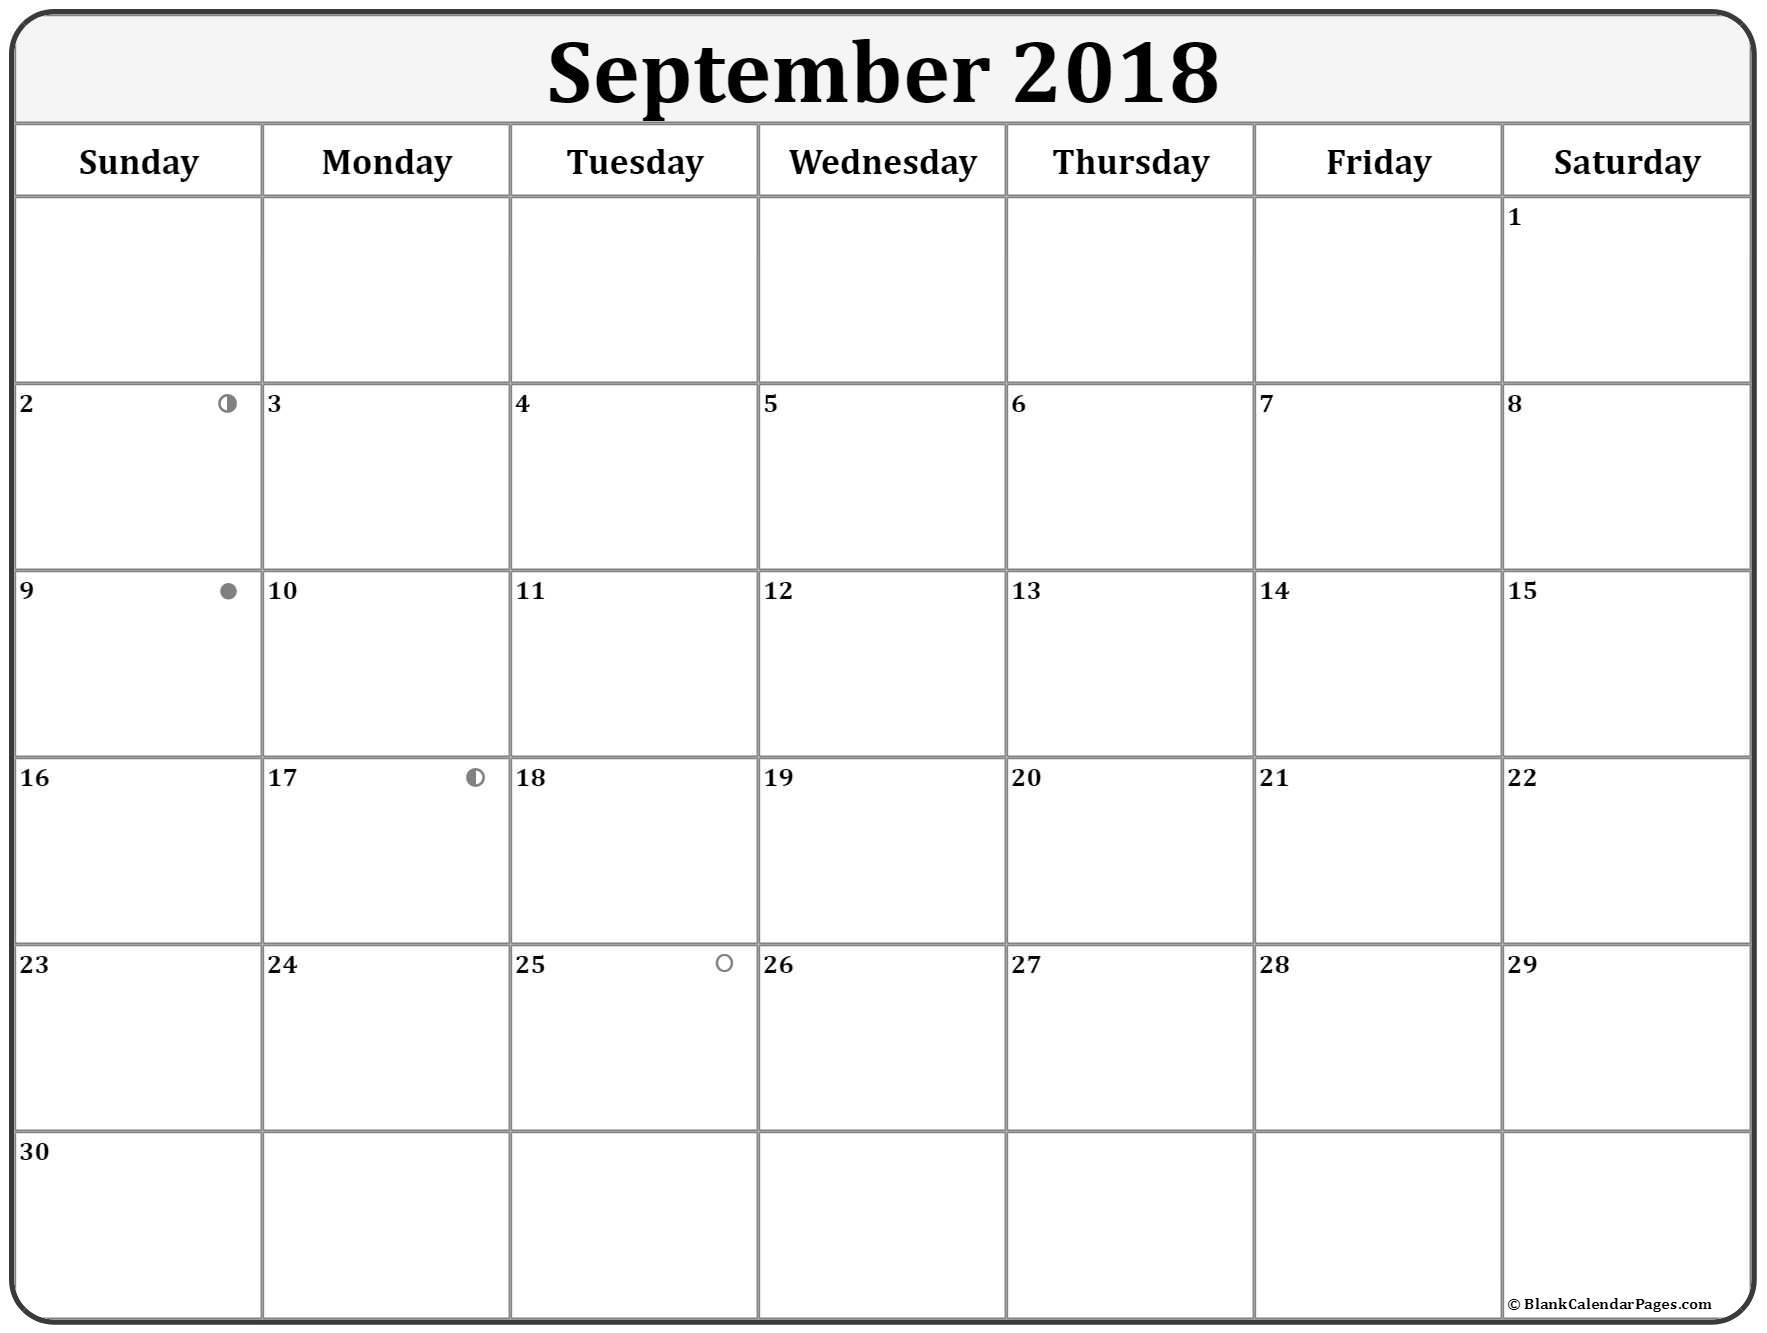 September 2018 Lunar Calendar